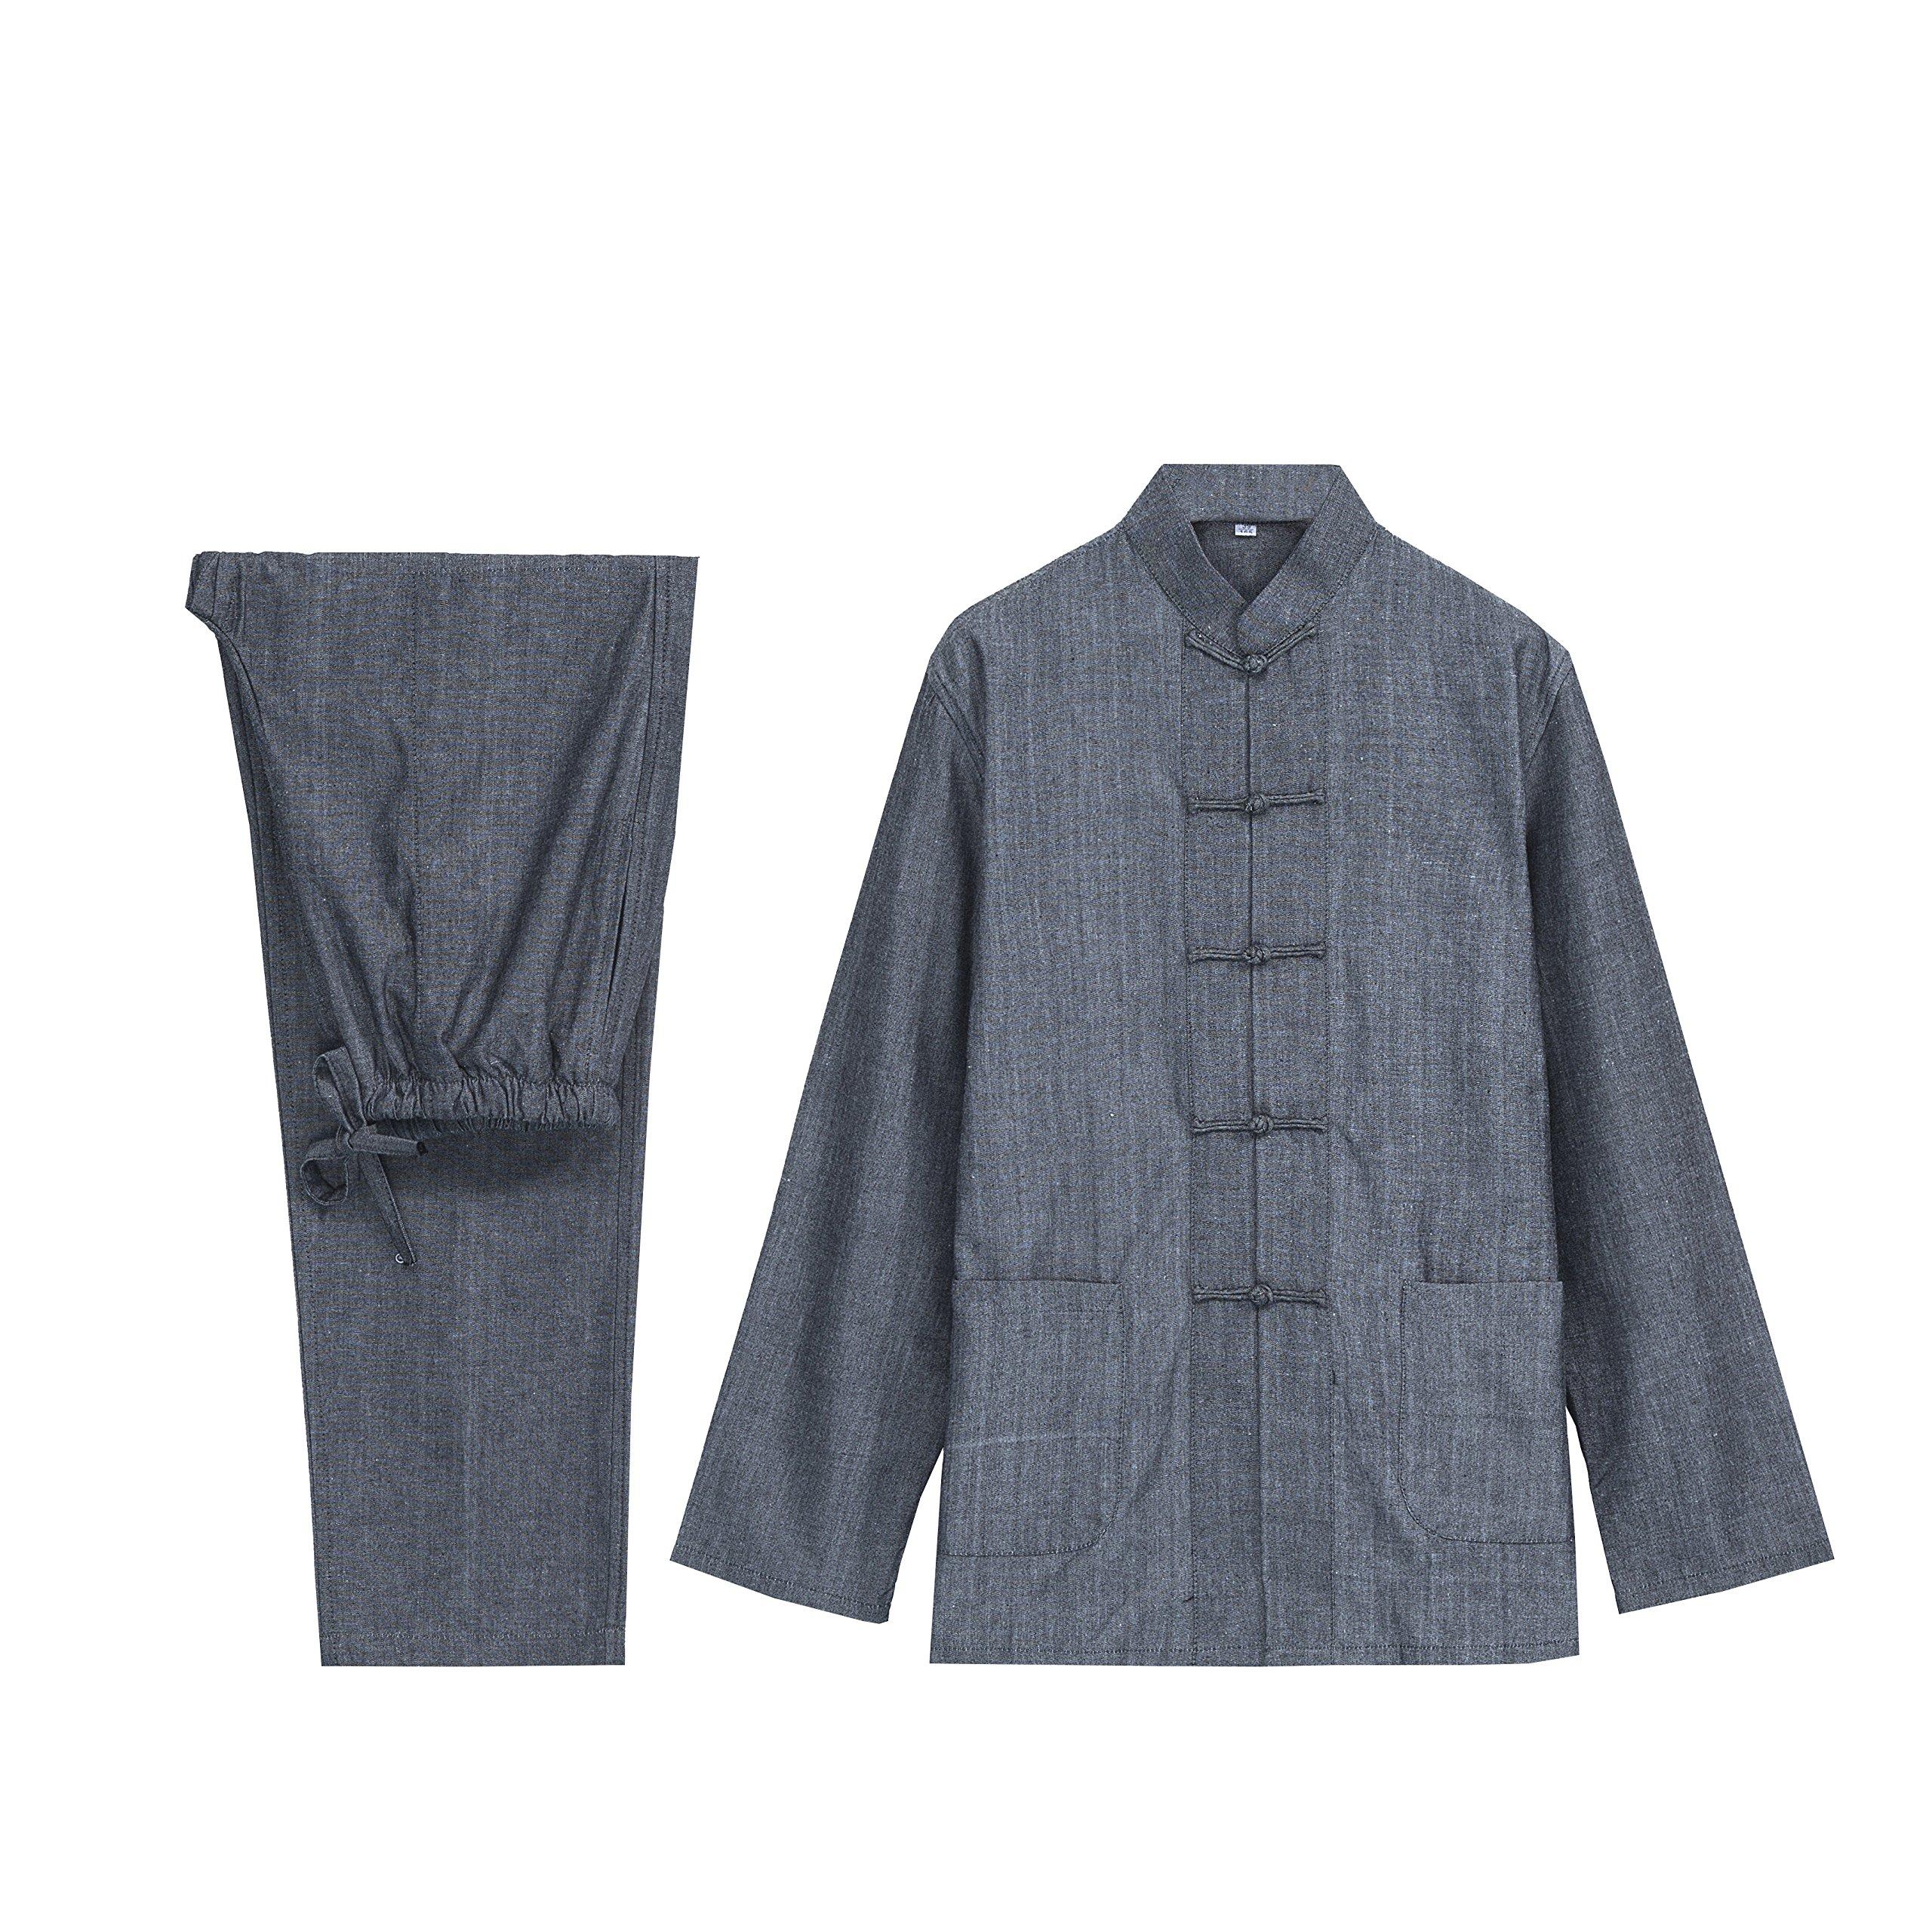 KUFEIUP Traditional Chinese Tang Suits Kung Fu Uniform Tai Chi Clothing For Men Dark Gray M